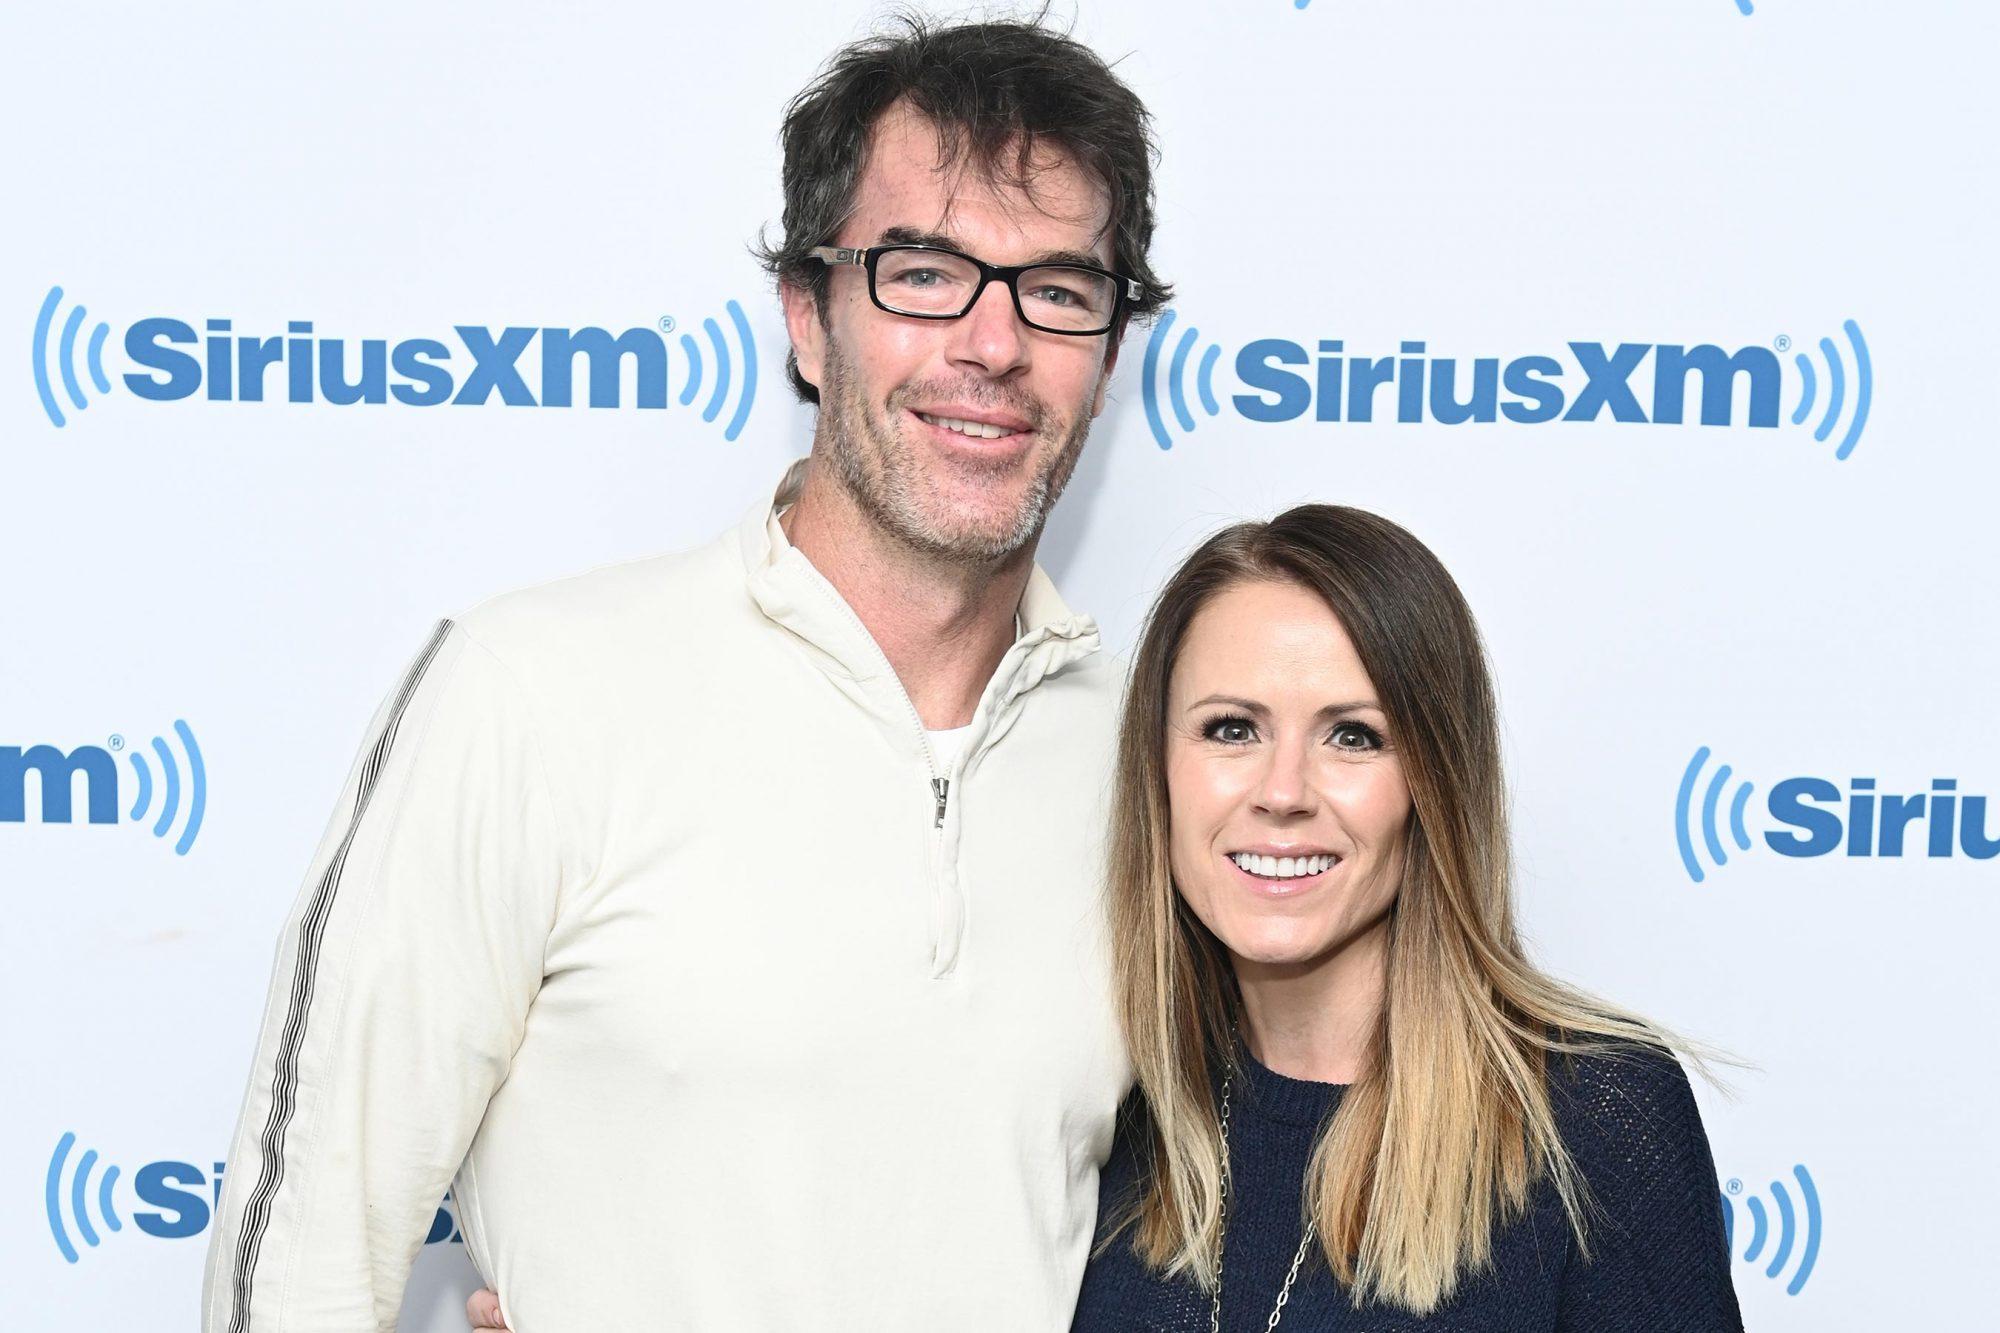 Celebrities Visit SiriusXM - March 21, 2019